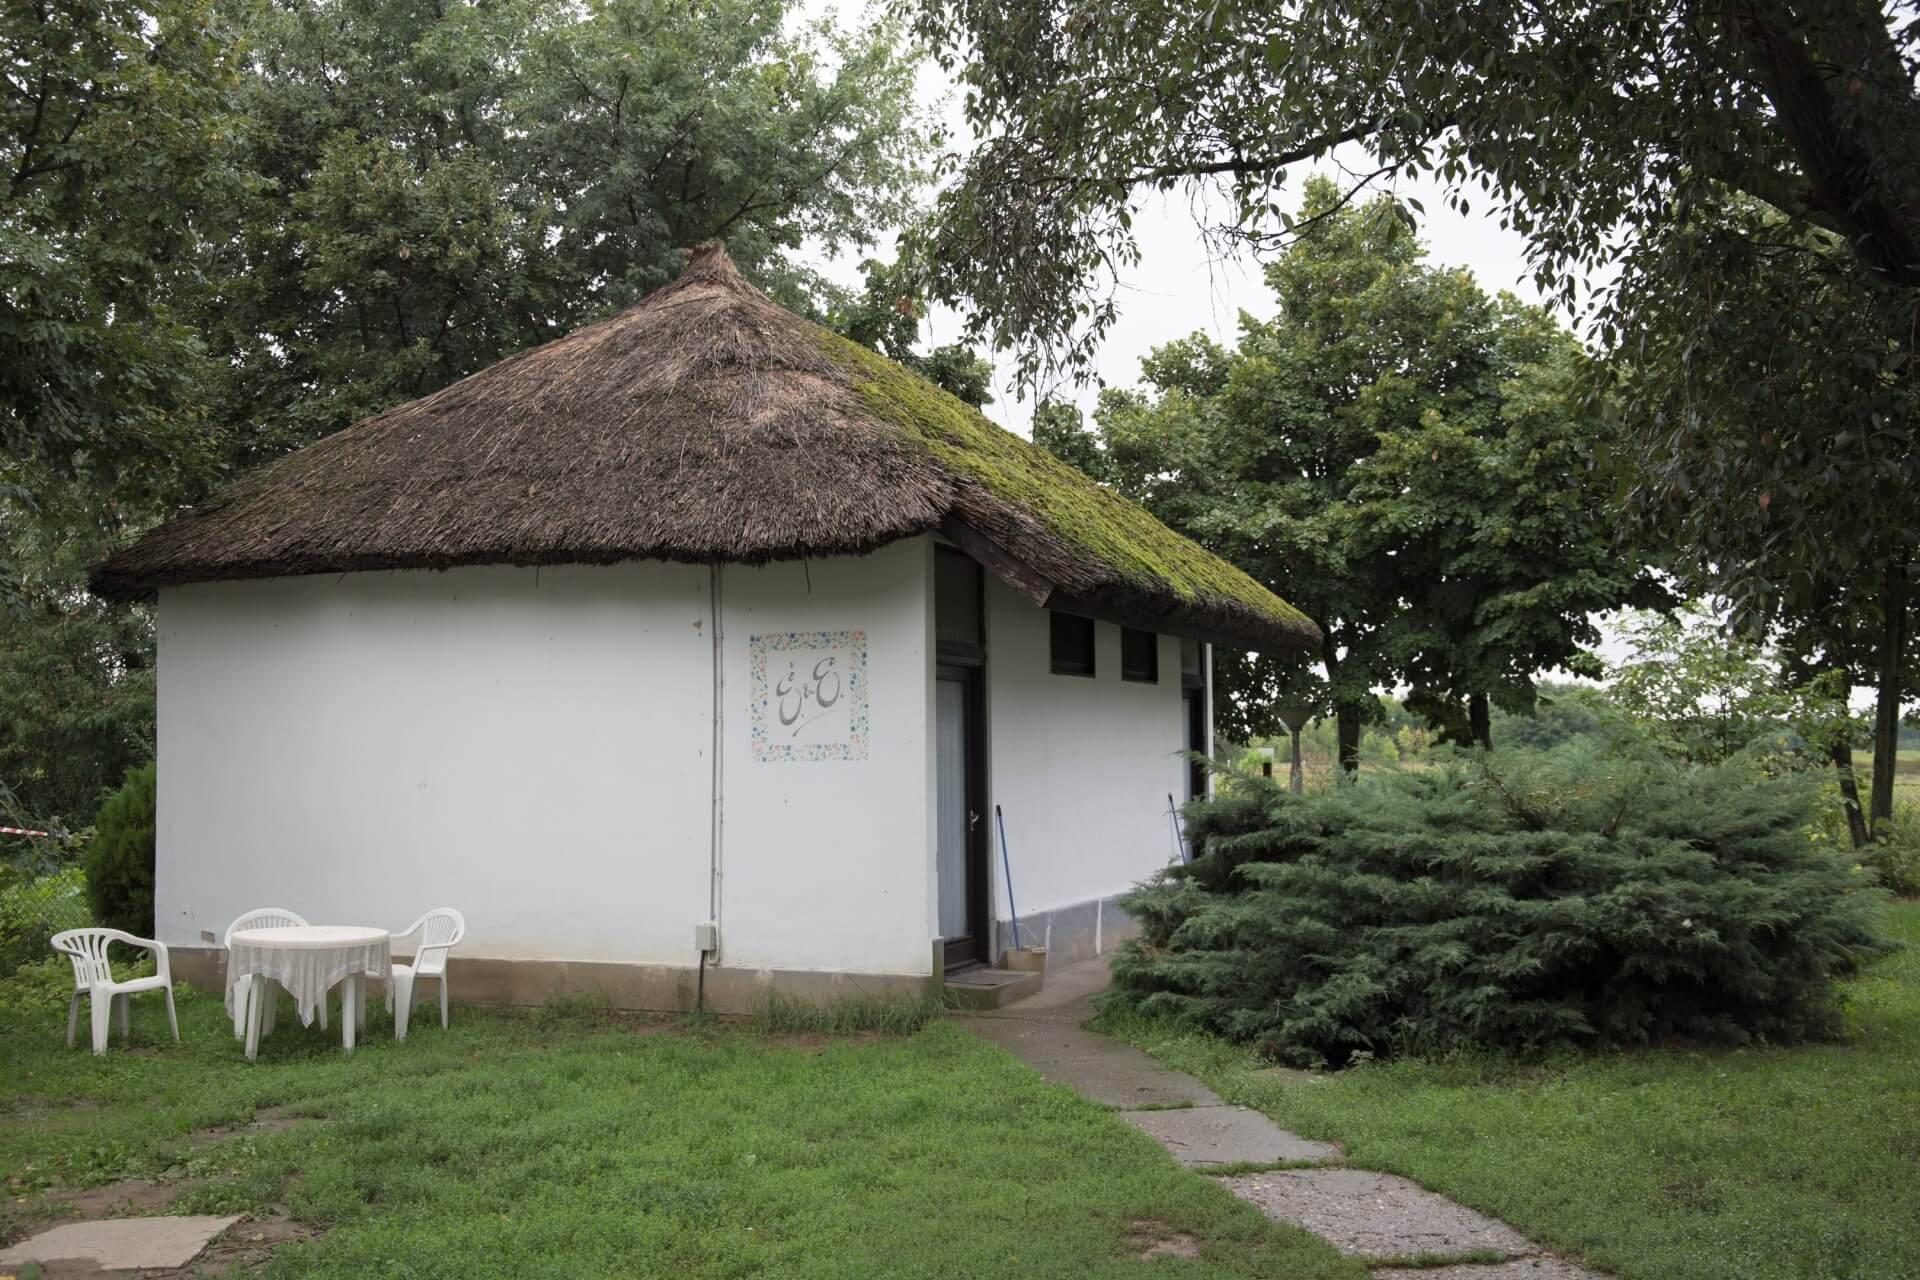 Bungalow zur Patkós Csárda